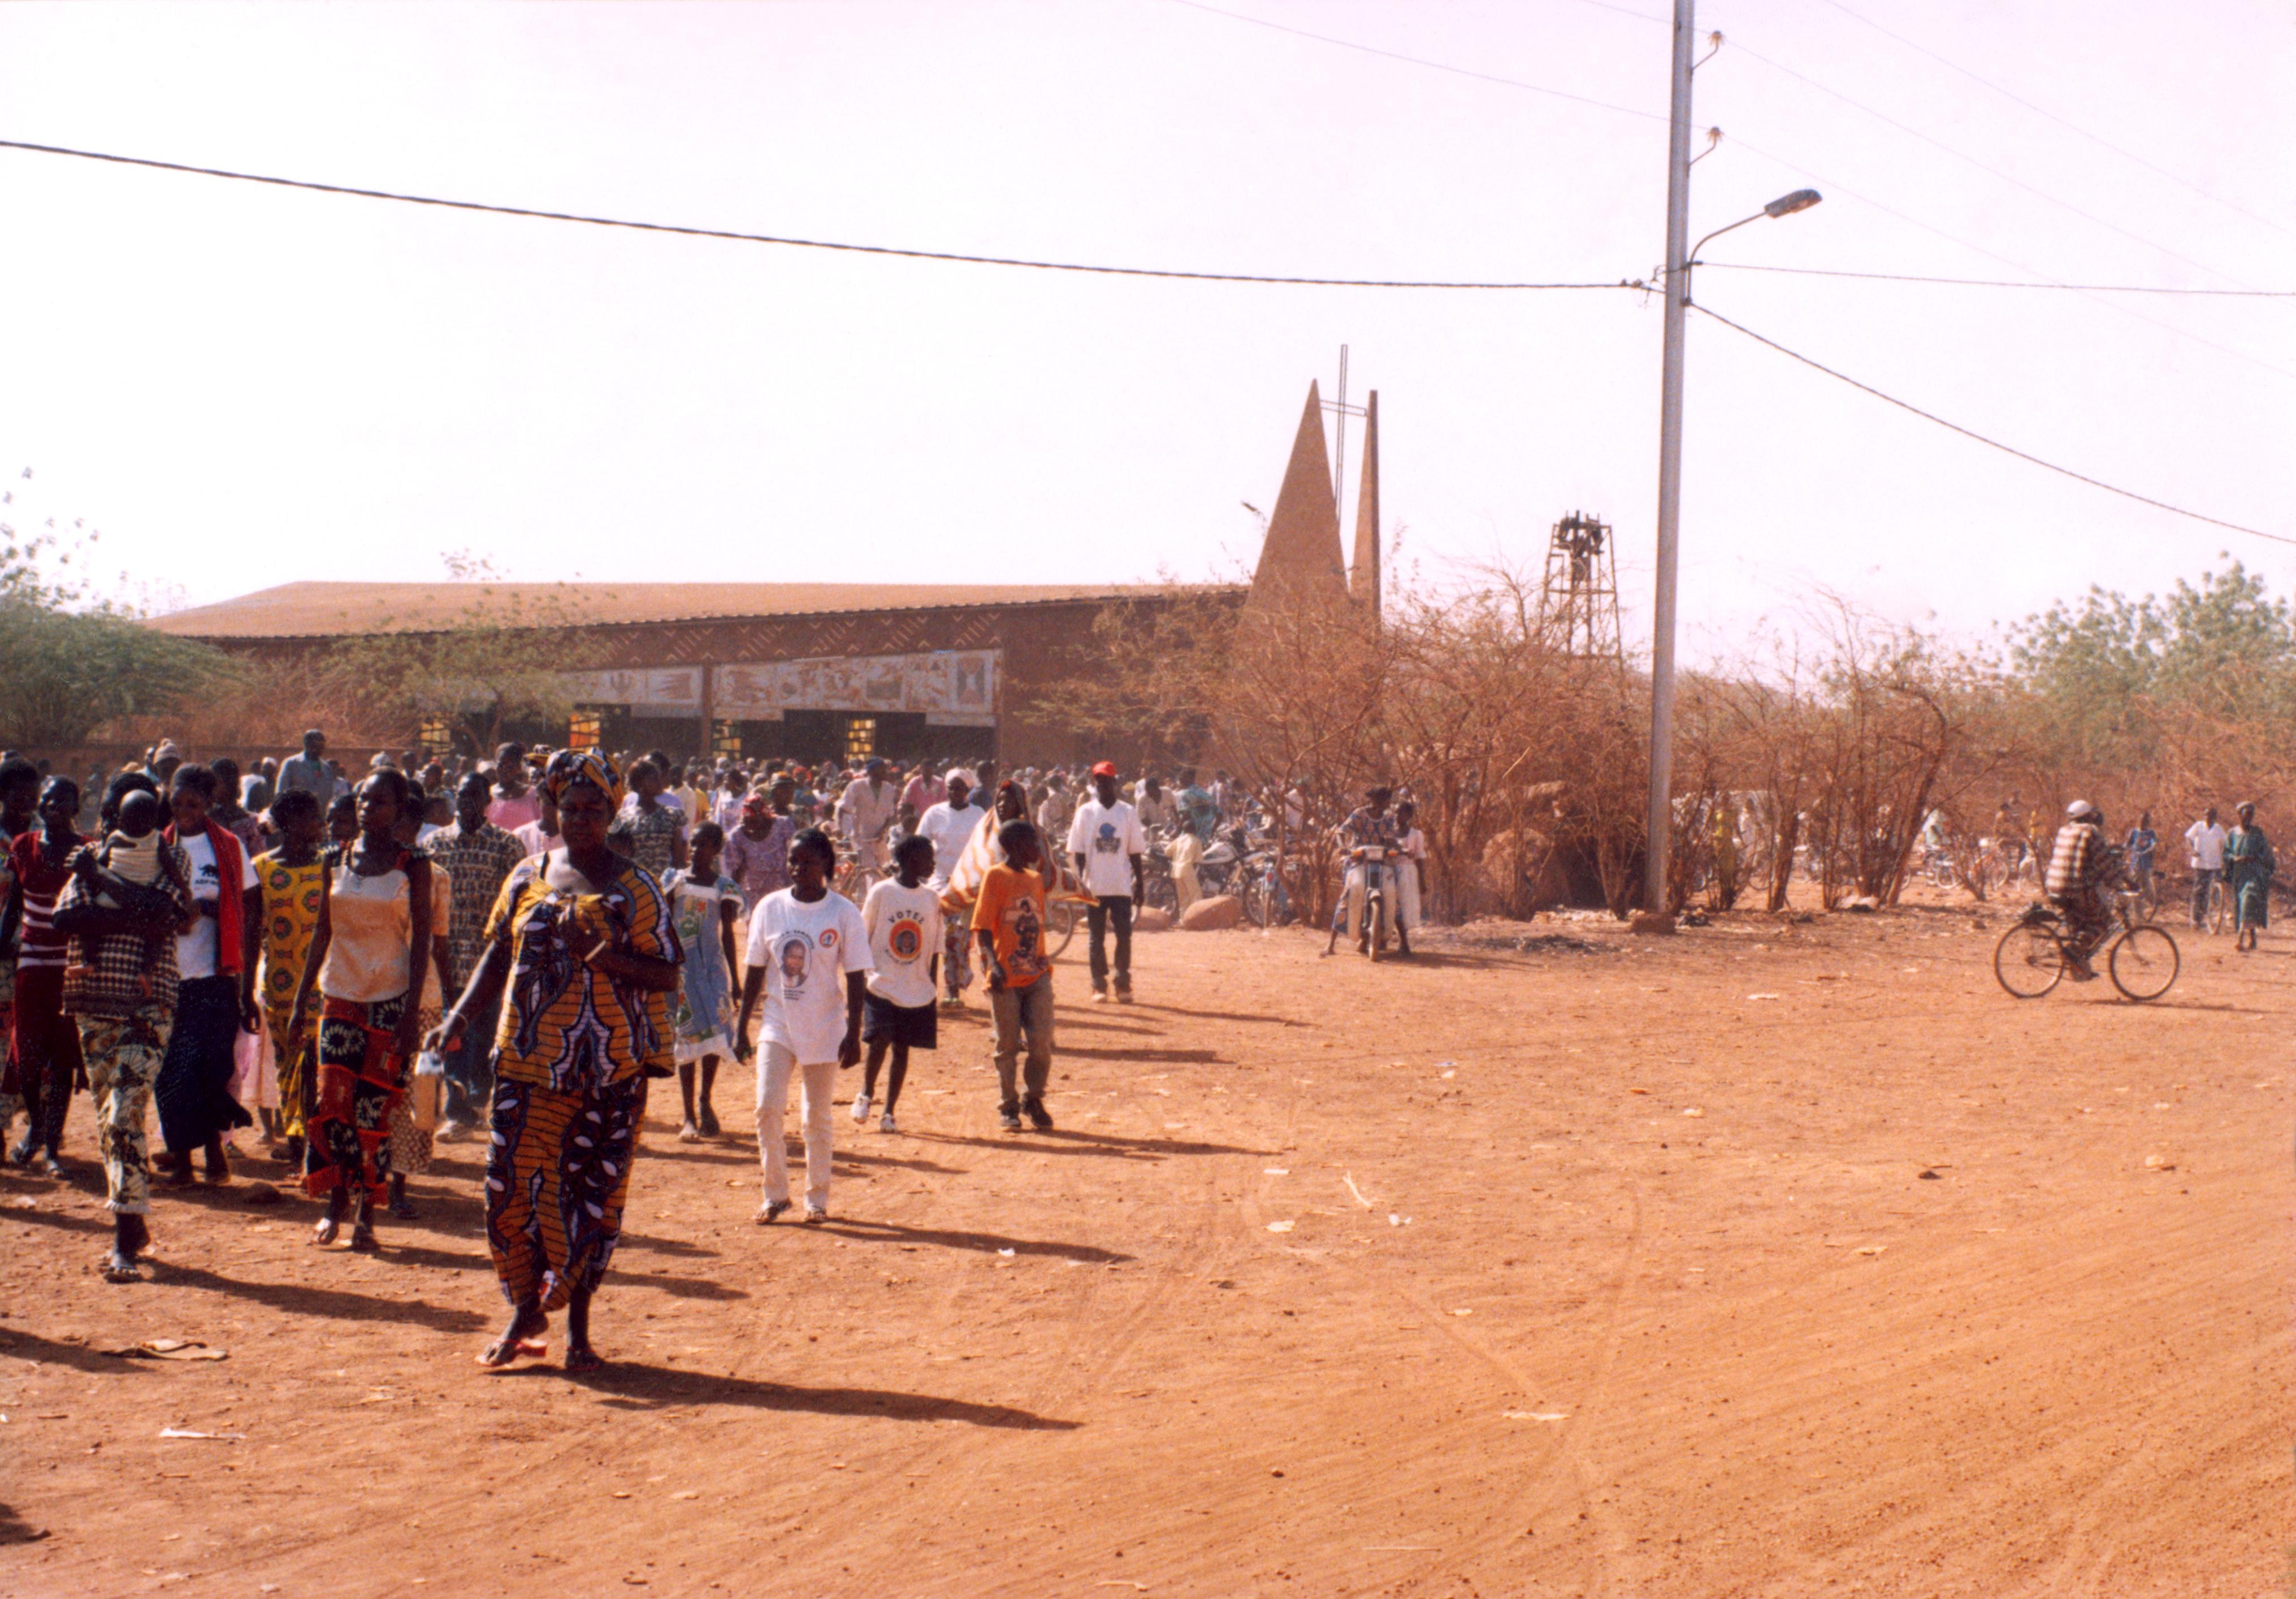 Obispo de Burkina Fasso divulga medidas de seguridad para los católicos